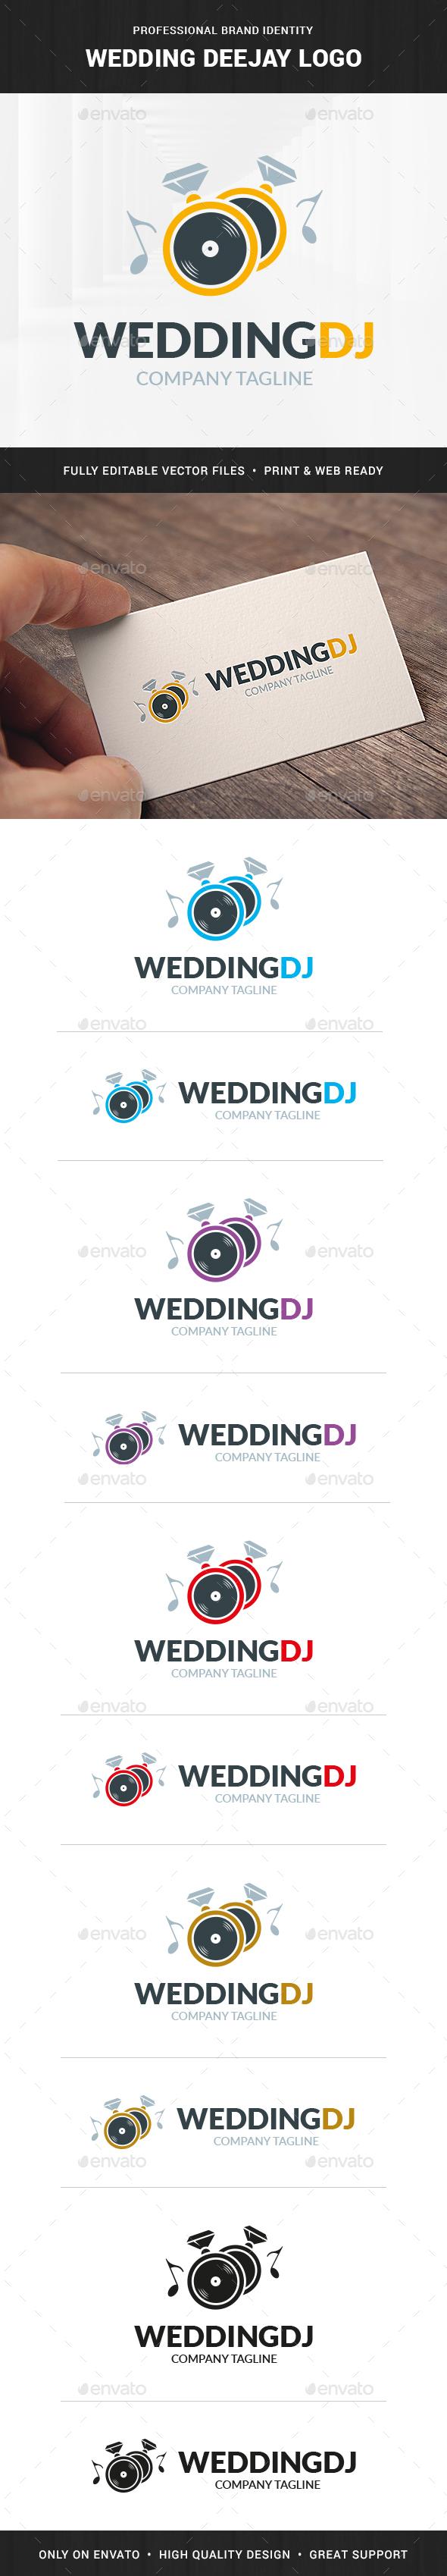 Wedding Deejay Logo